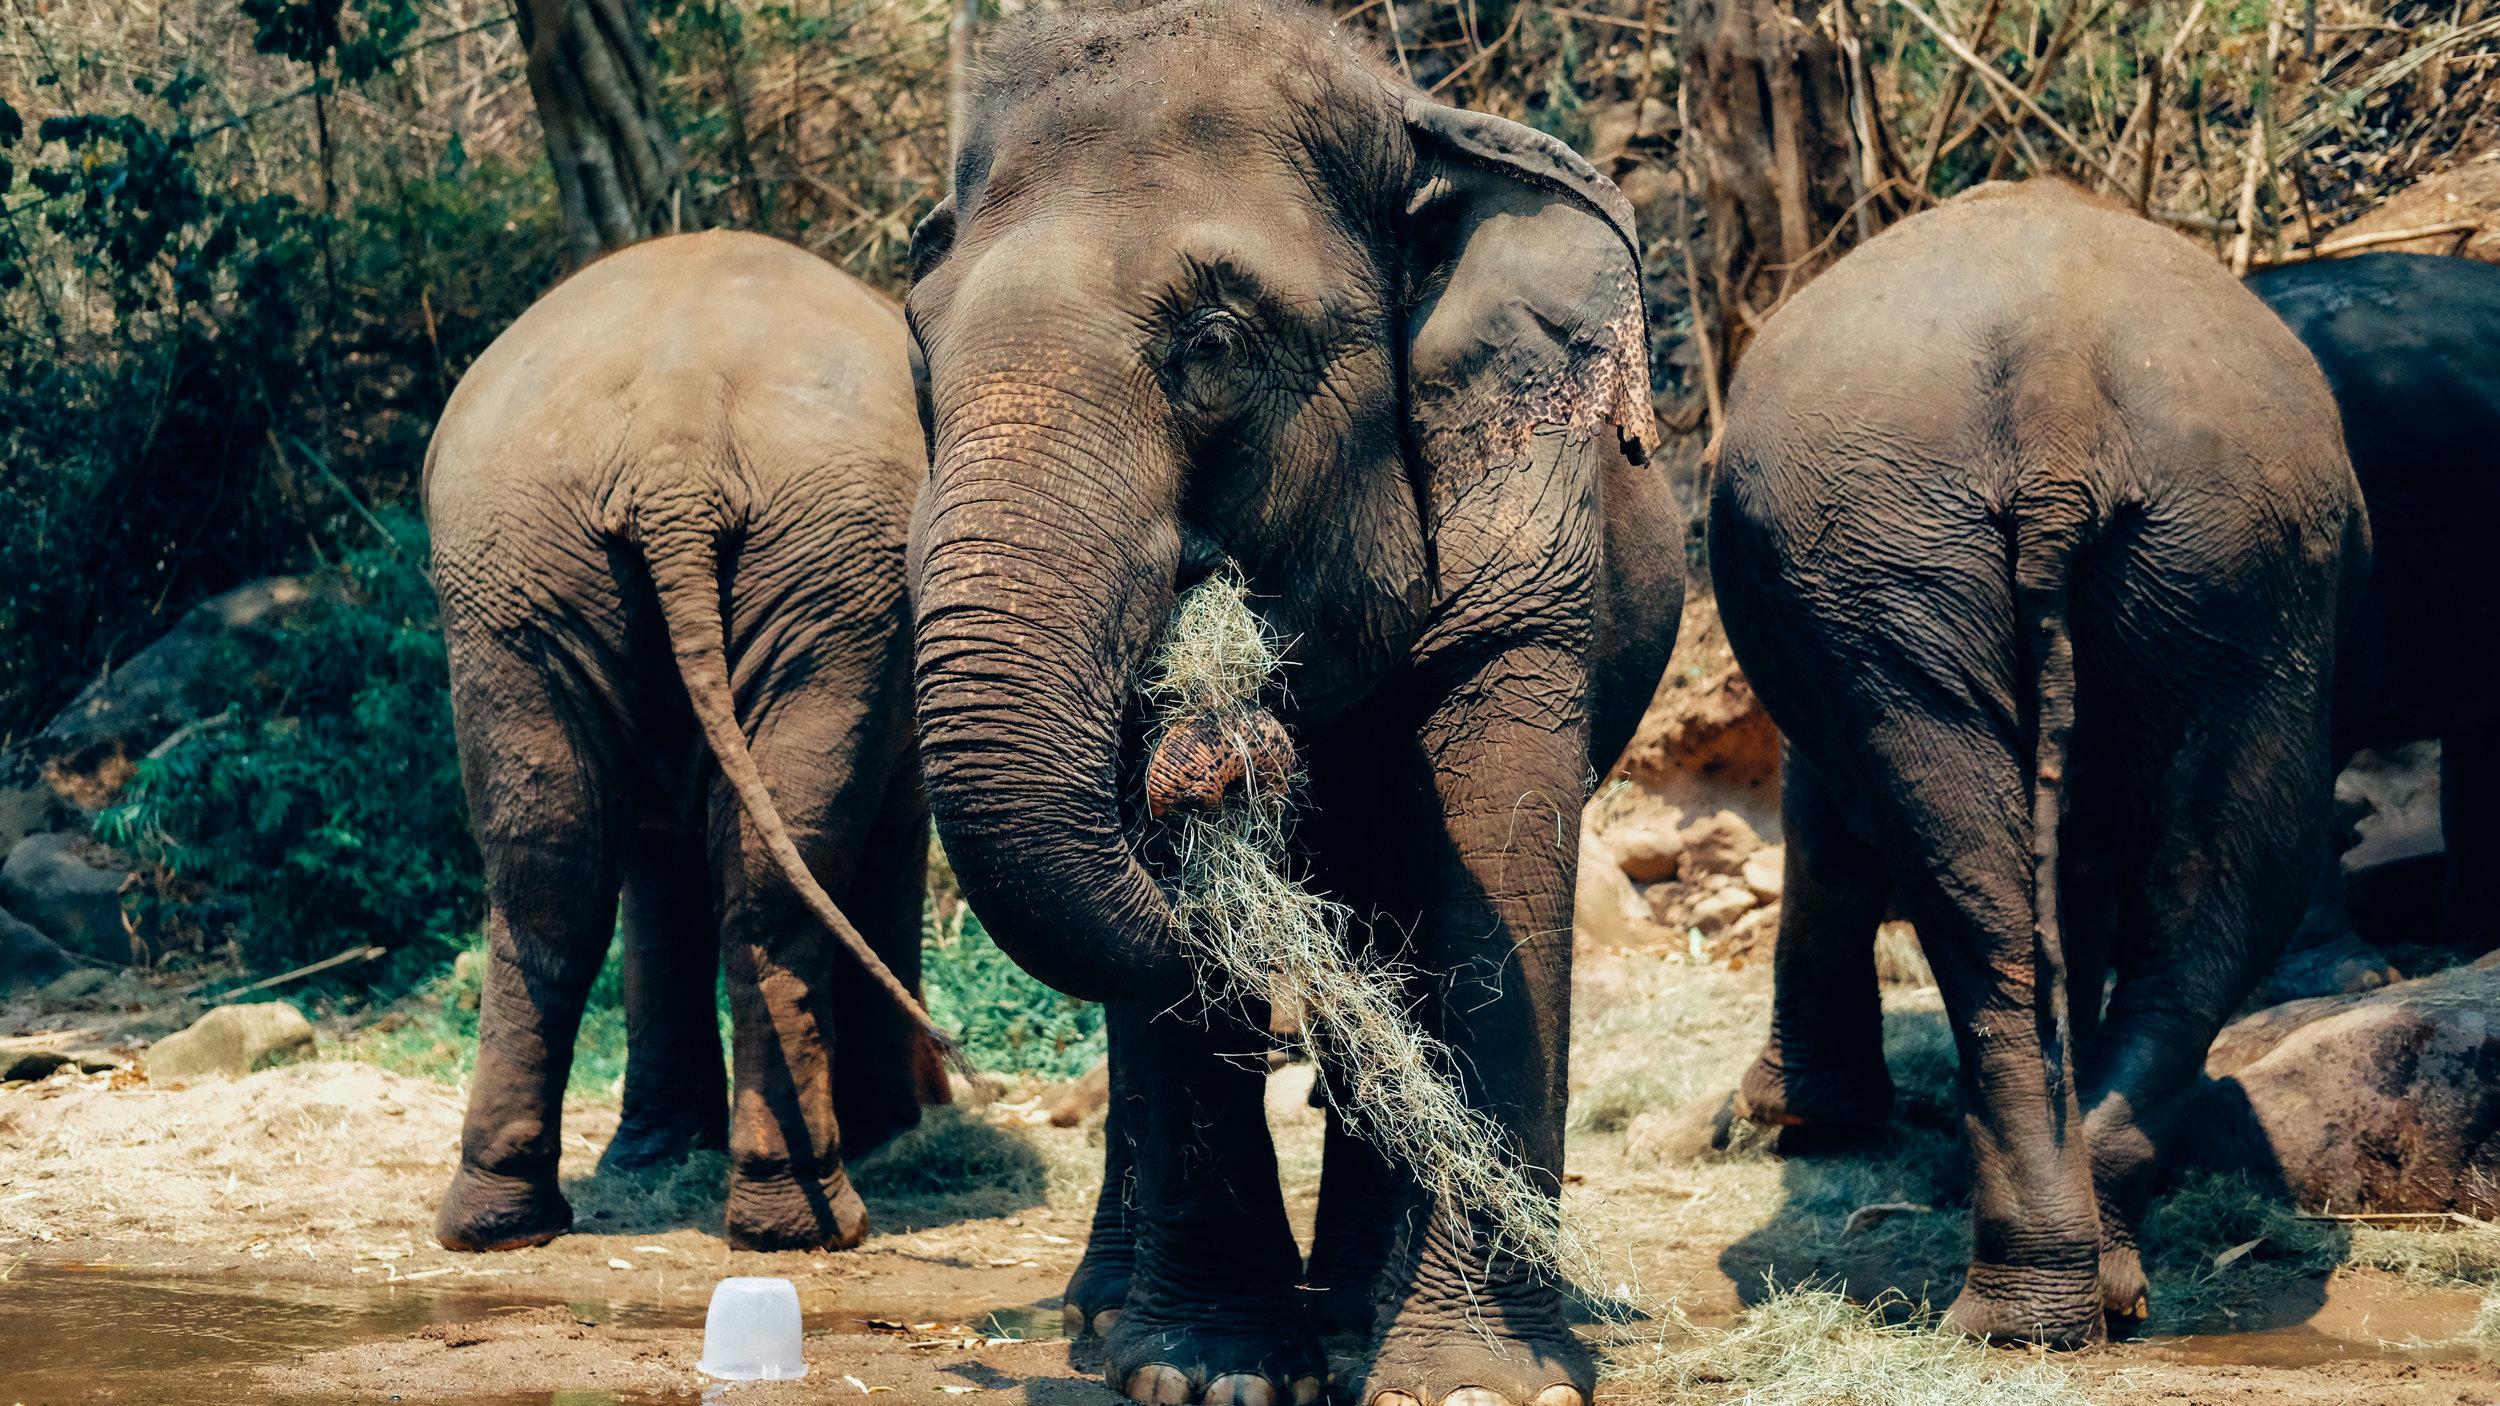 Elephants eating after their bath